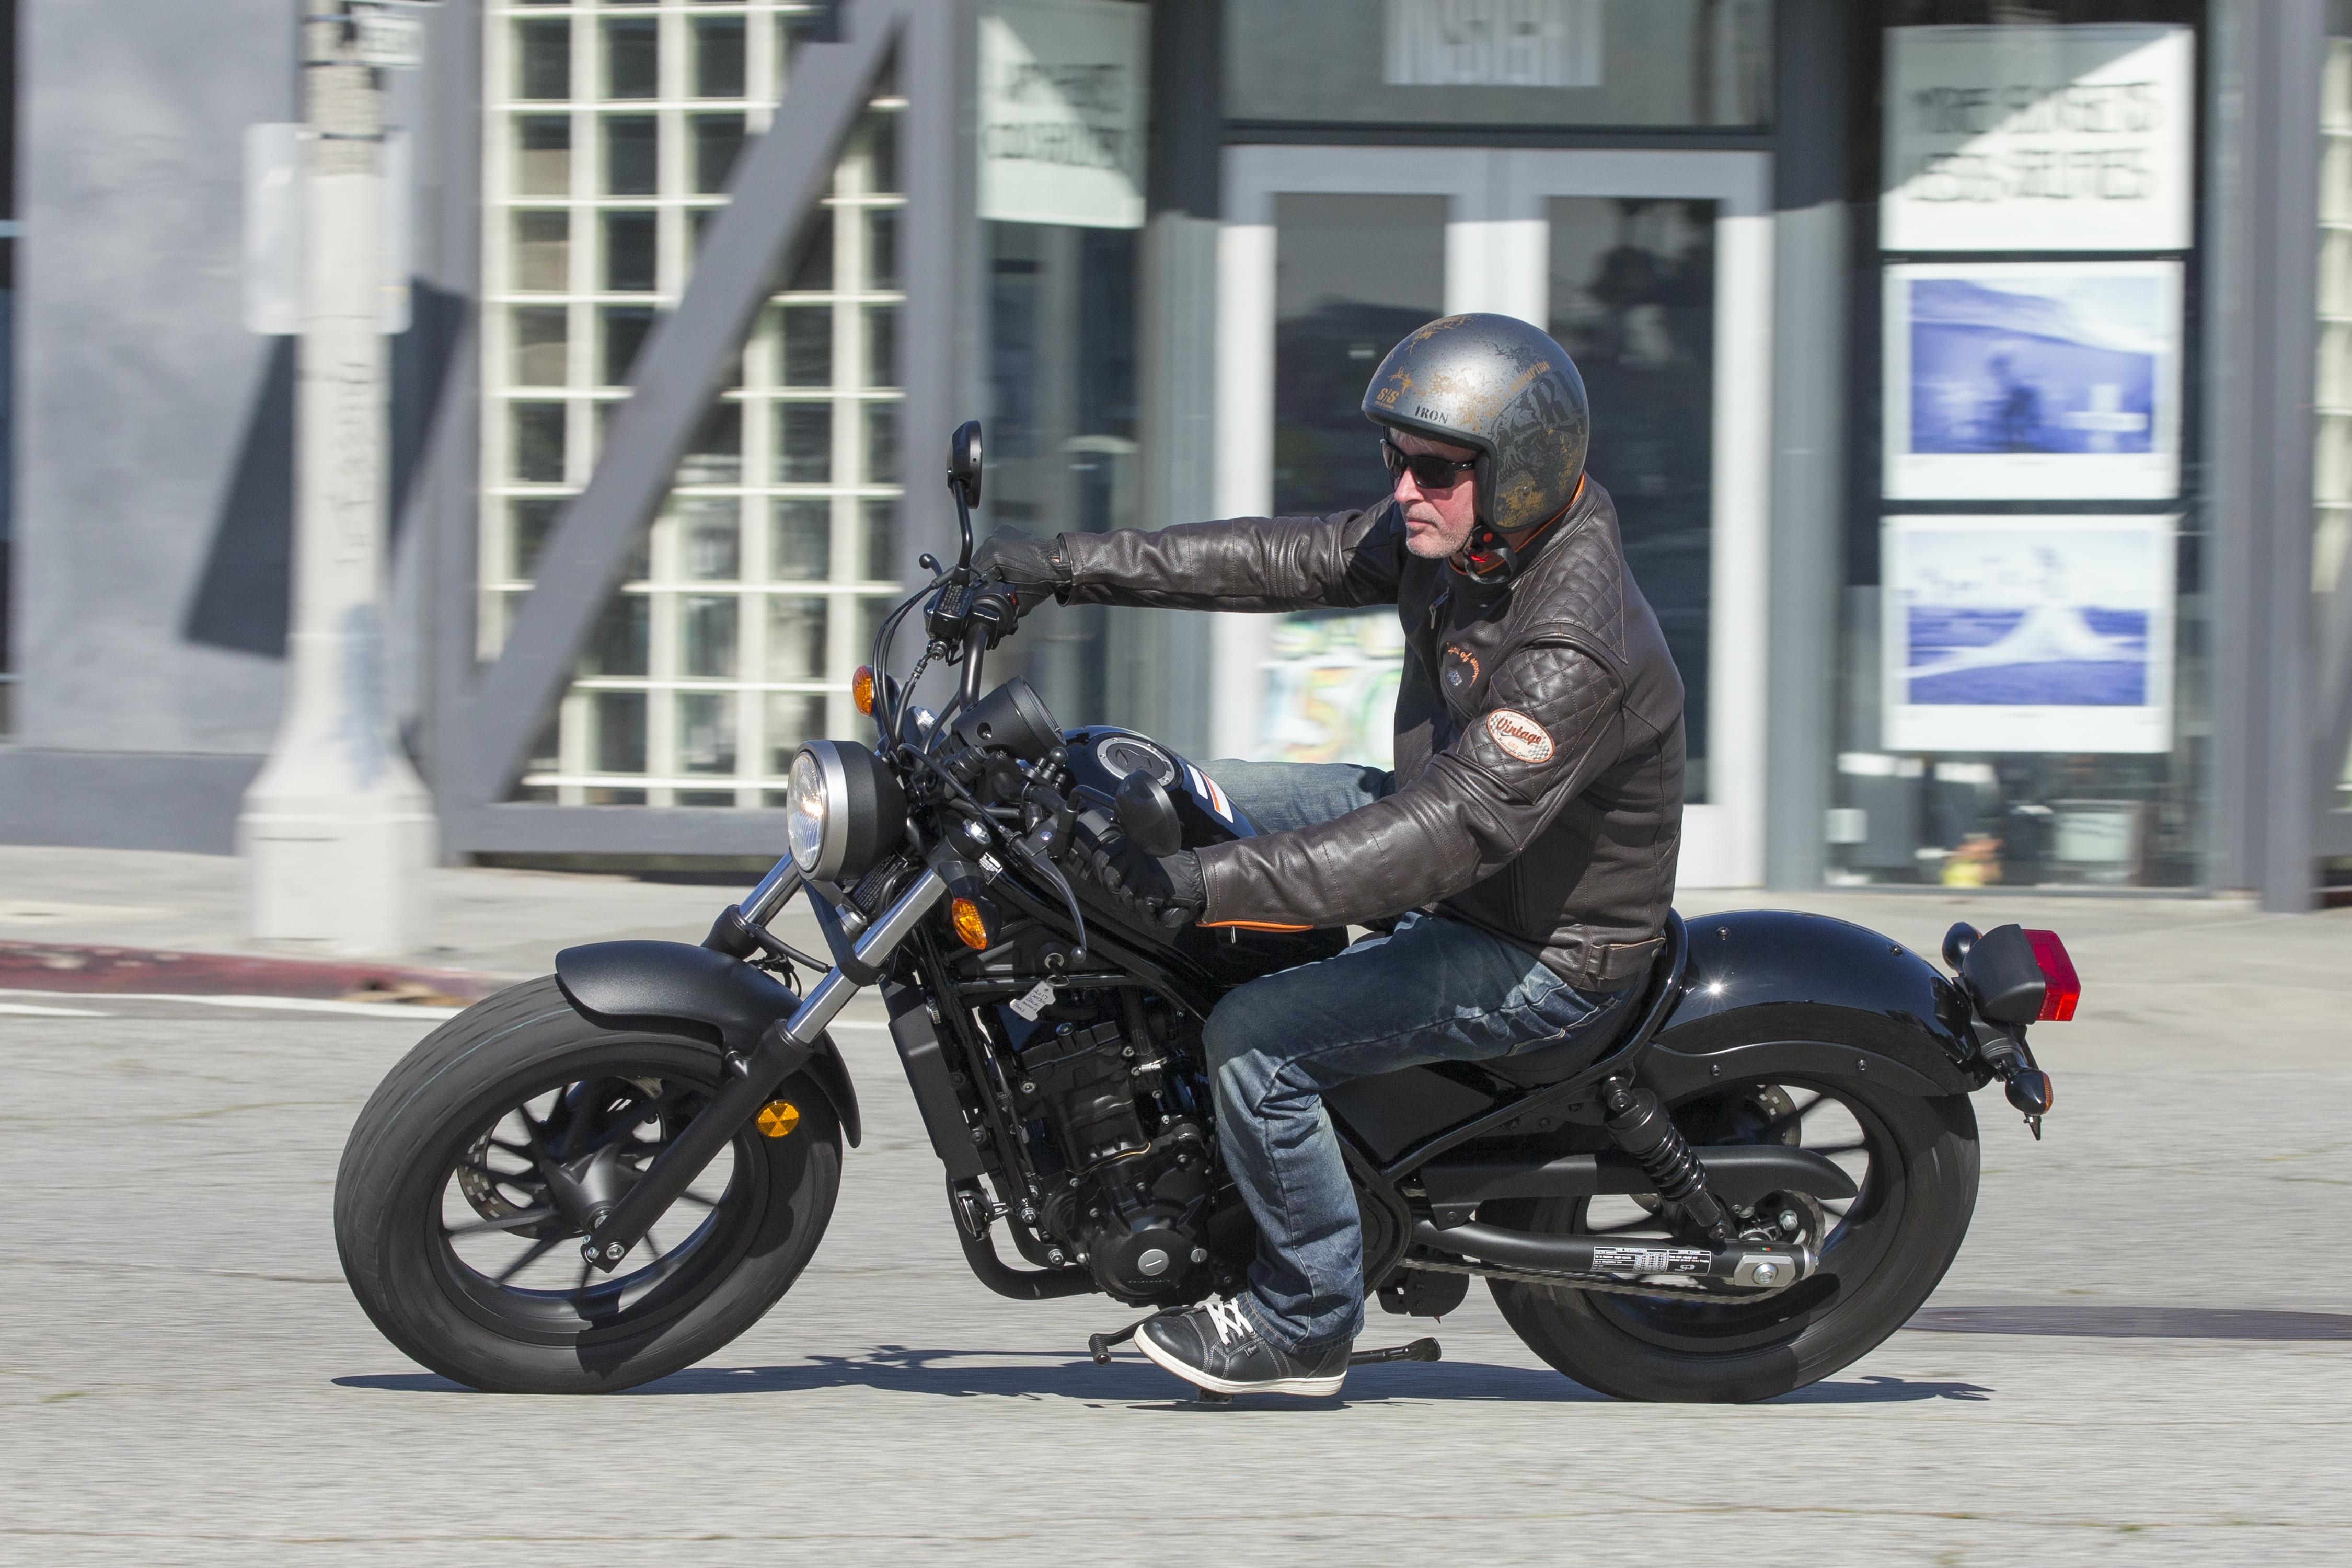 2017 Honda Rebel 300 & Rebel 500 Cruiser Motorcycle Review